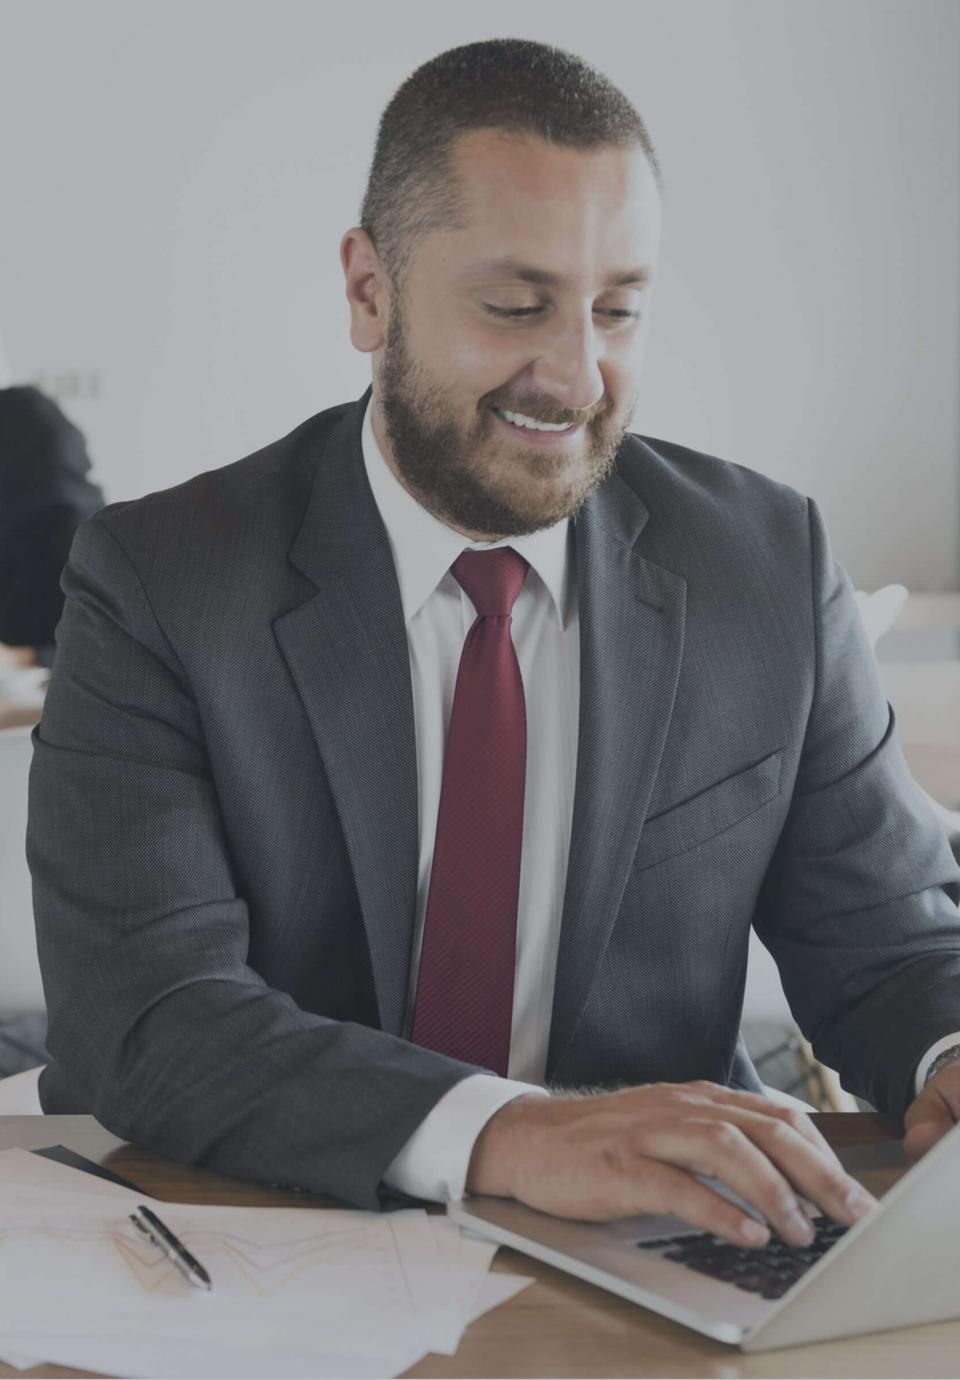 Accounting Recruitment Finance Recruitment Robert Half Accounting Jobs Recruitment Recruitment Services